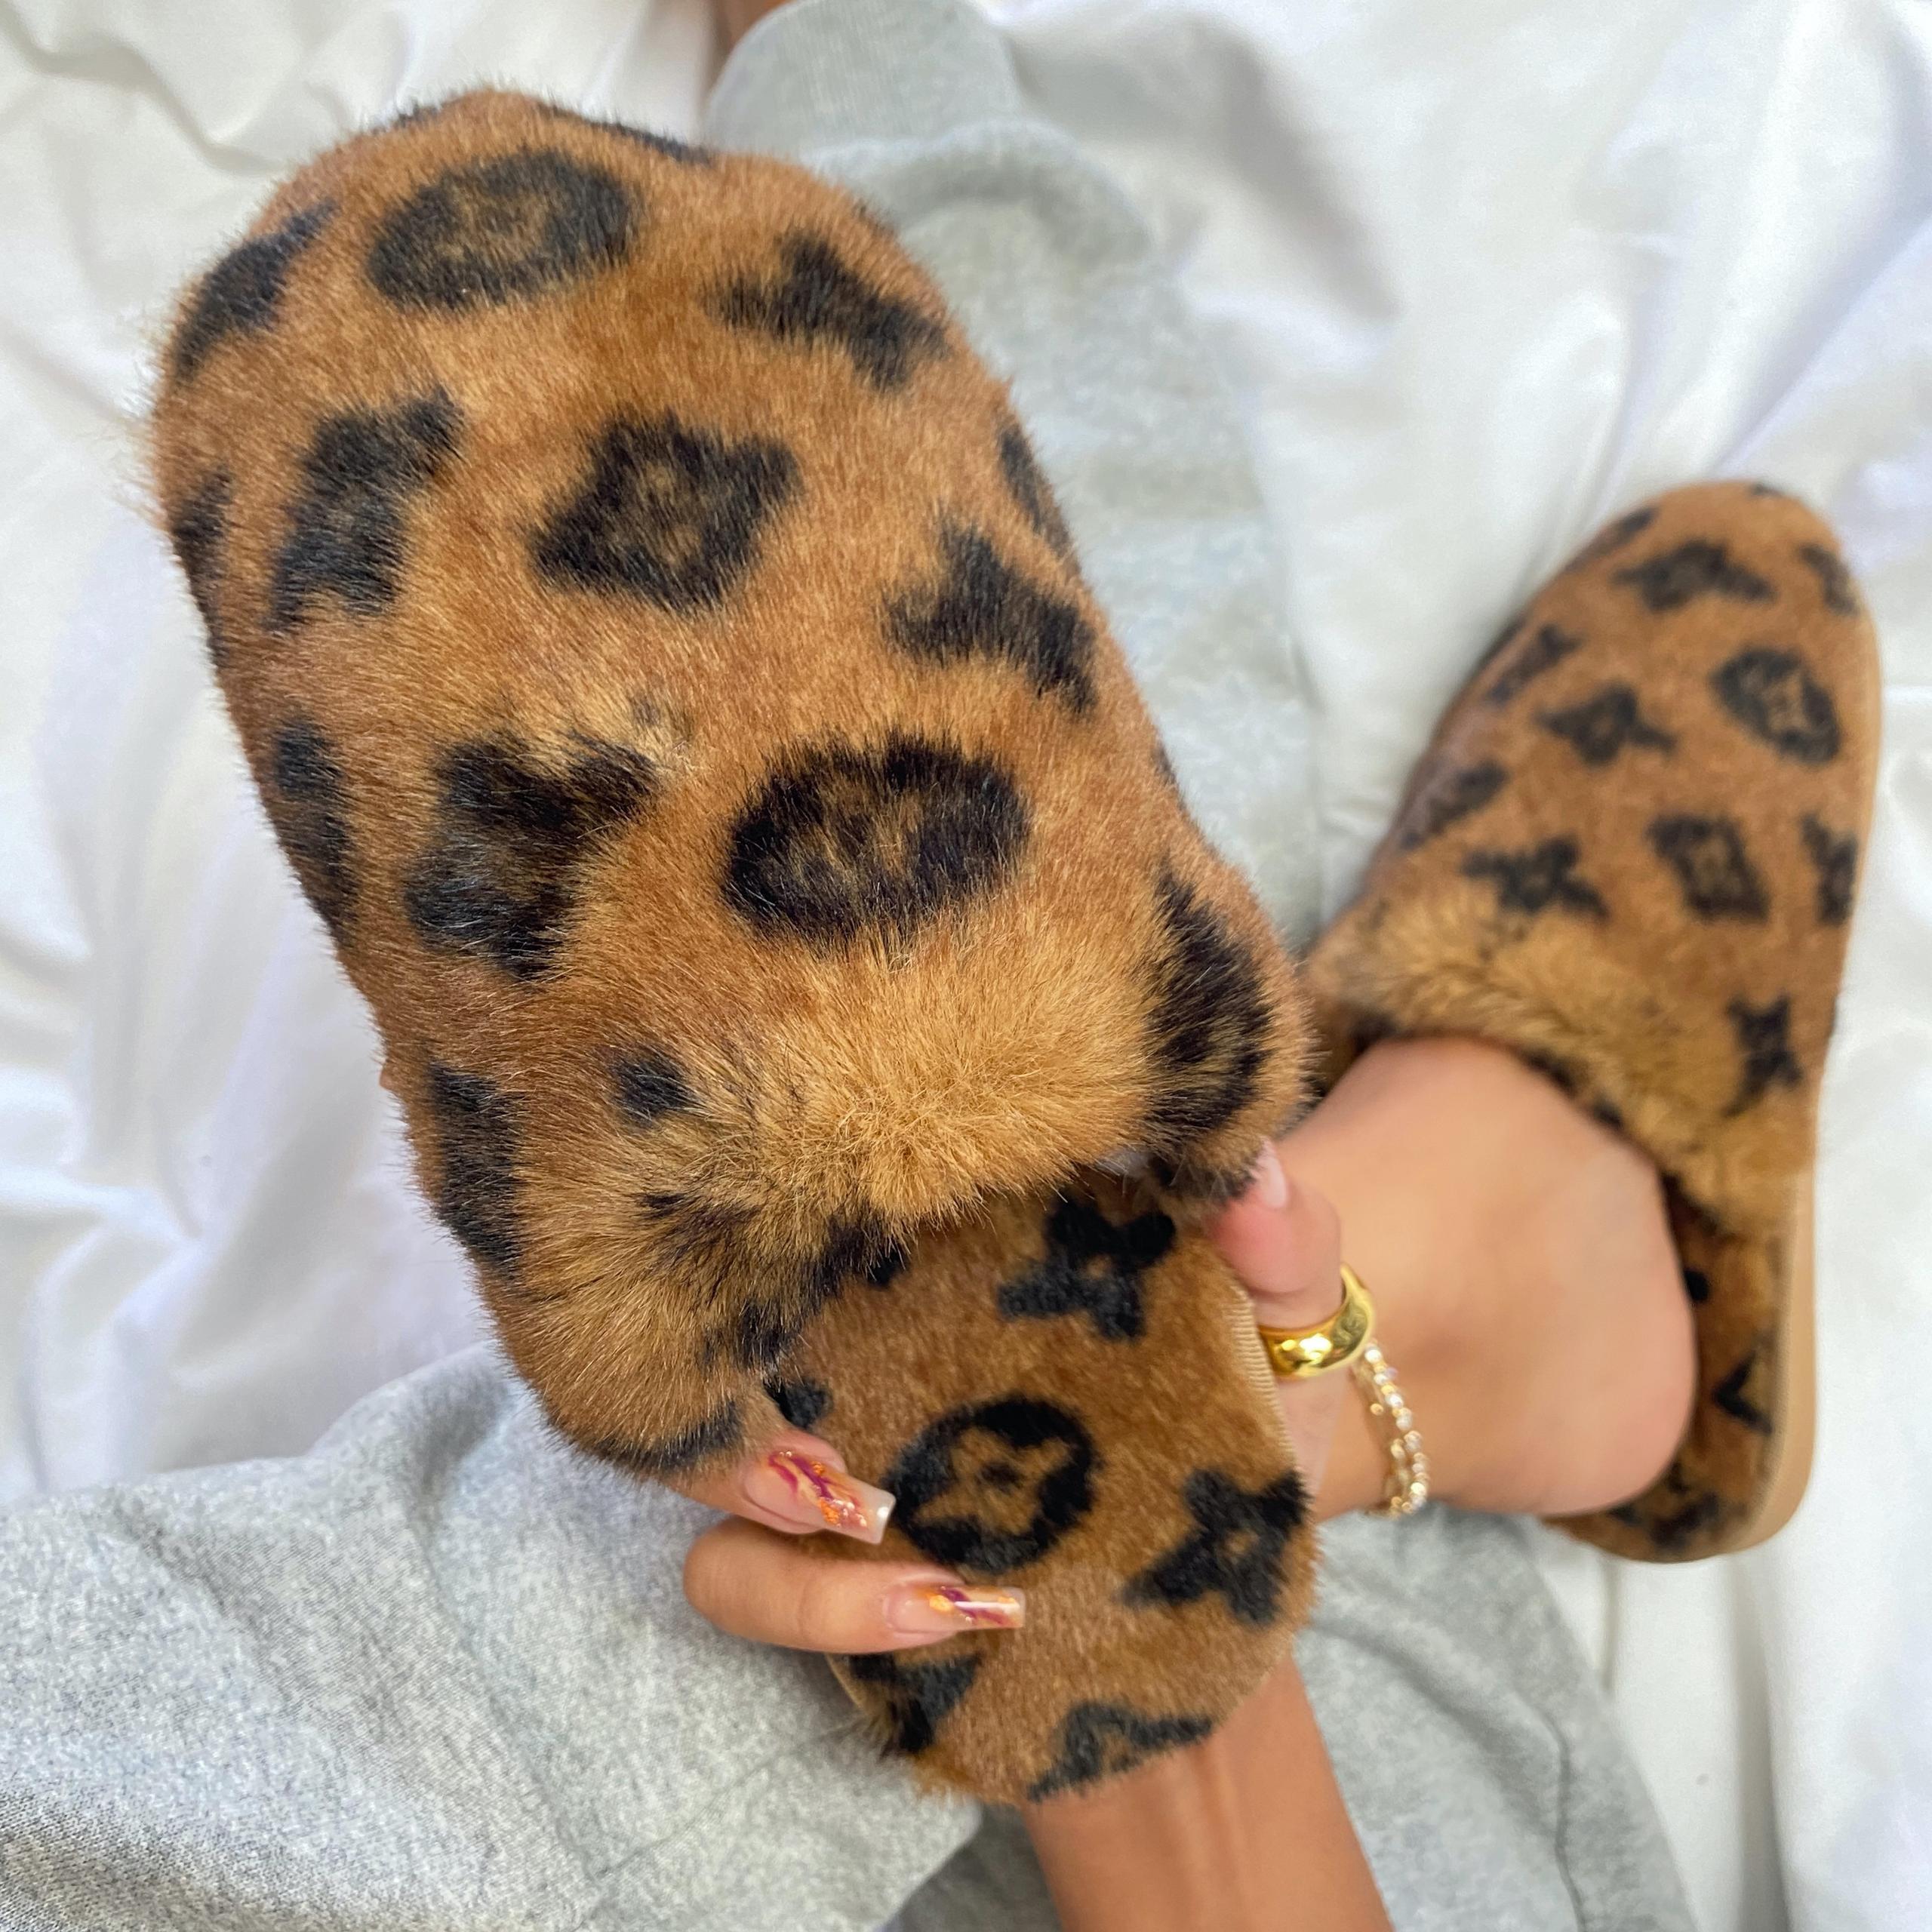 EGO Kulture Fluffy Printed Detail Flat Slipper In Tan Brown Faux Fur, Brown  - female - Size: 5